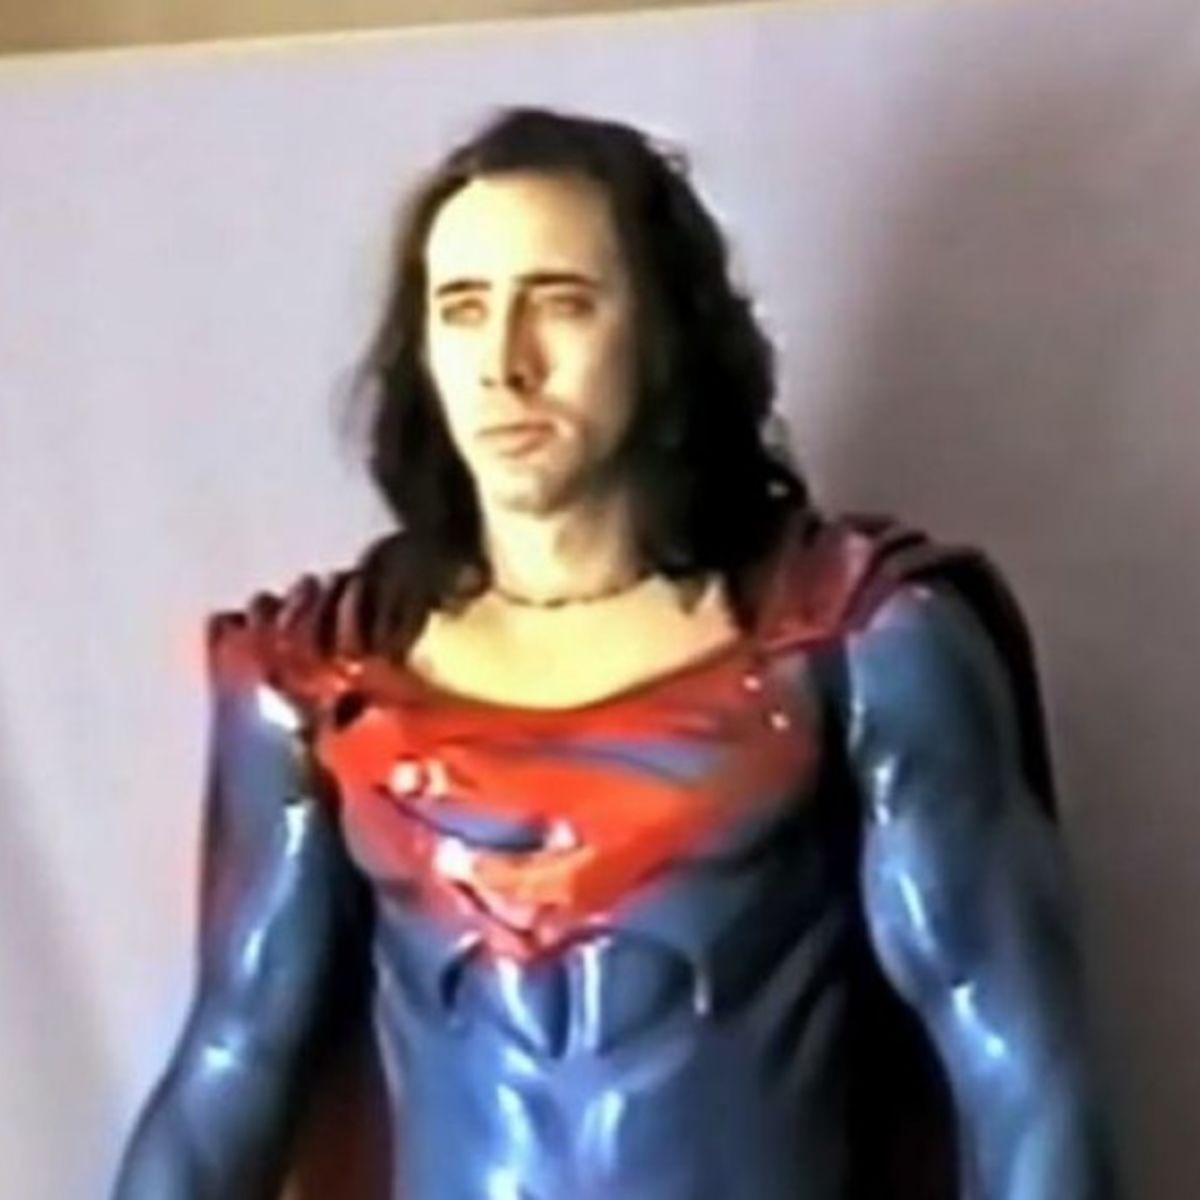 nicolas_cage_superman_lives_1050_591_81_s_c1.jpg